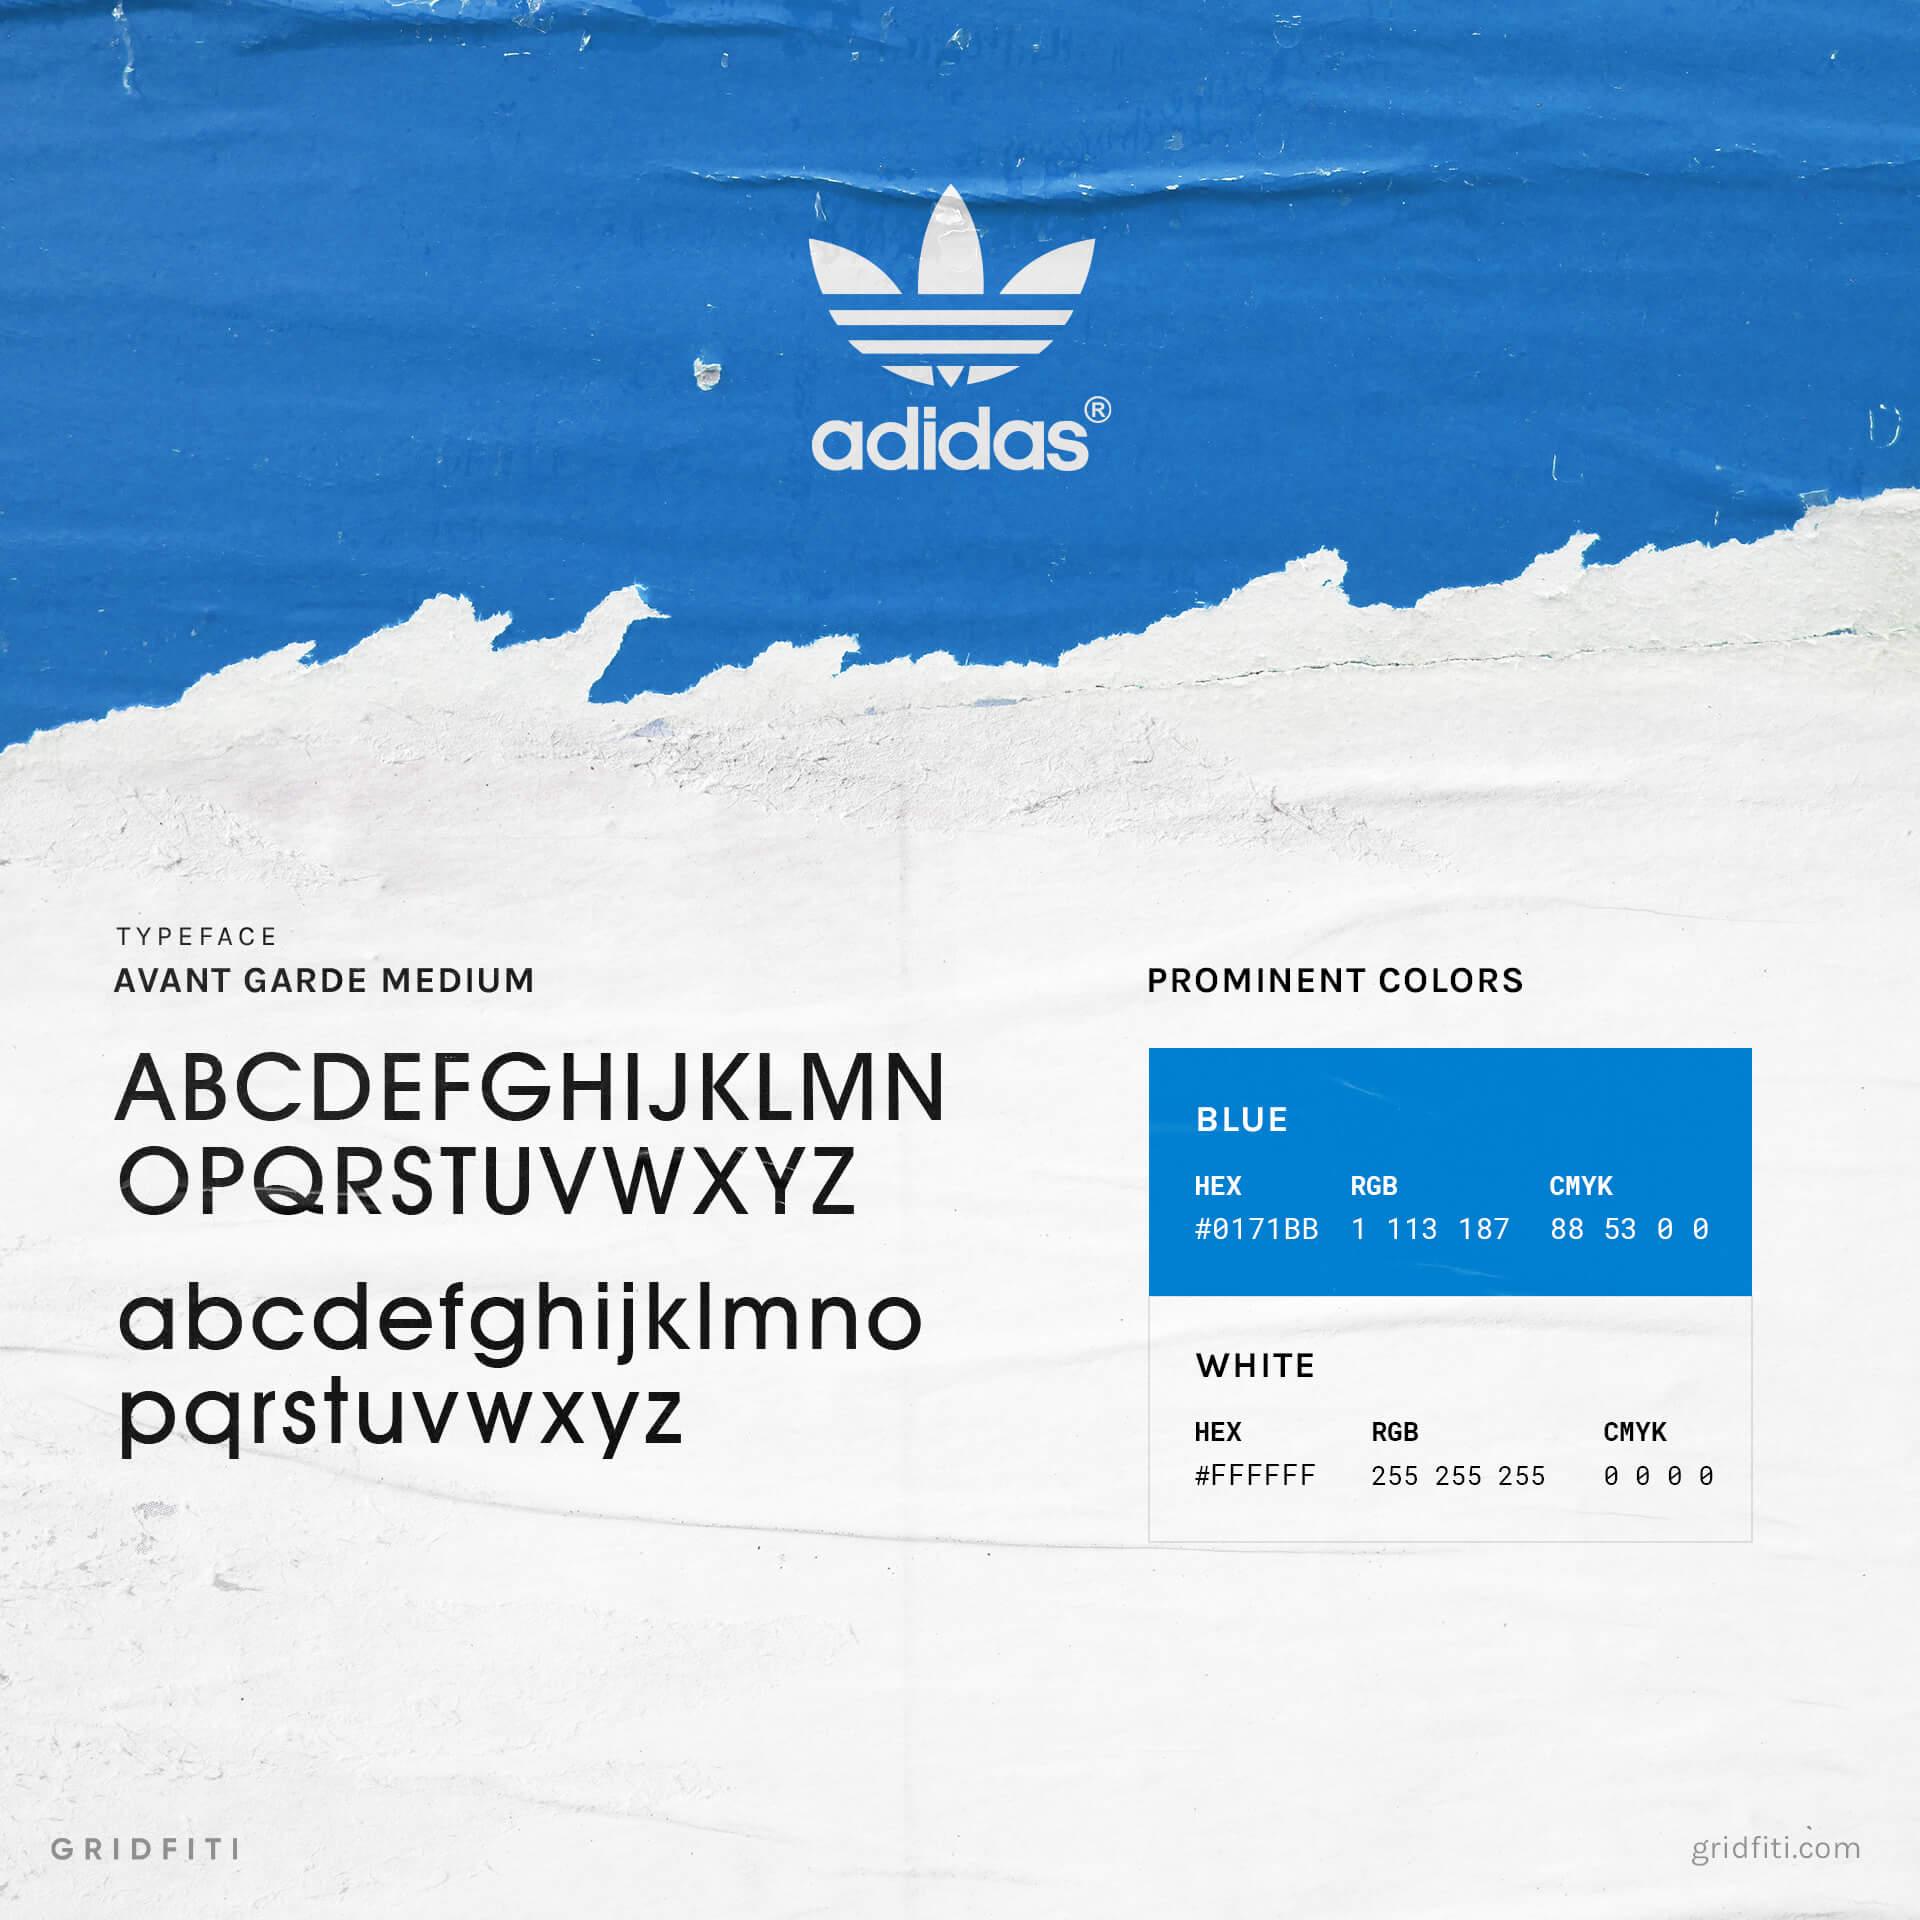 Adidas Font & Brand Colors